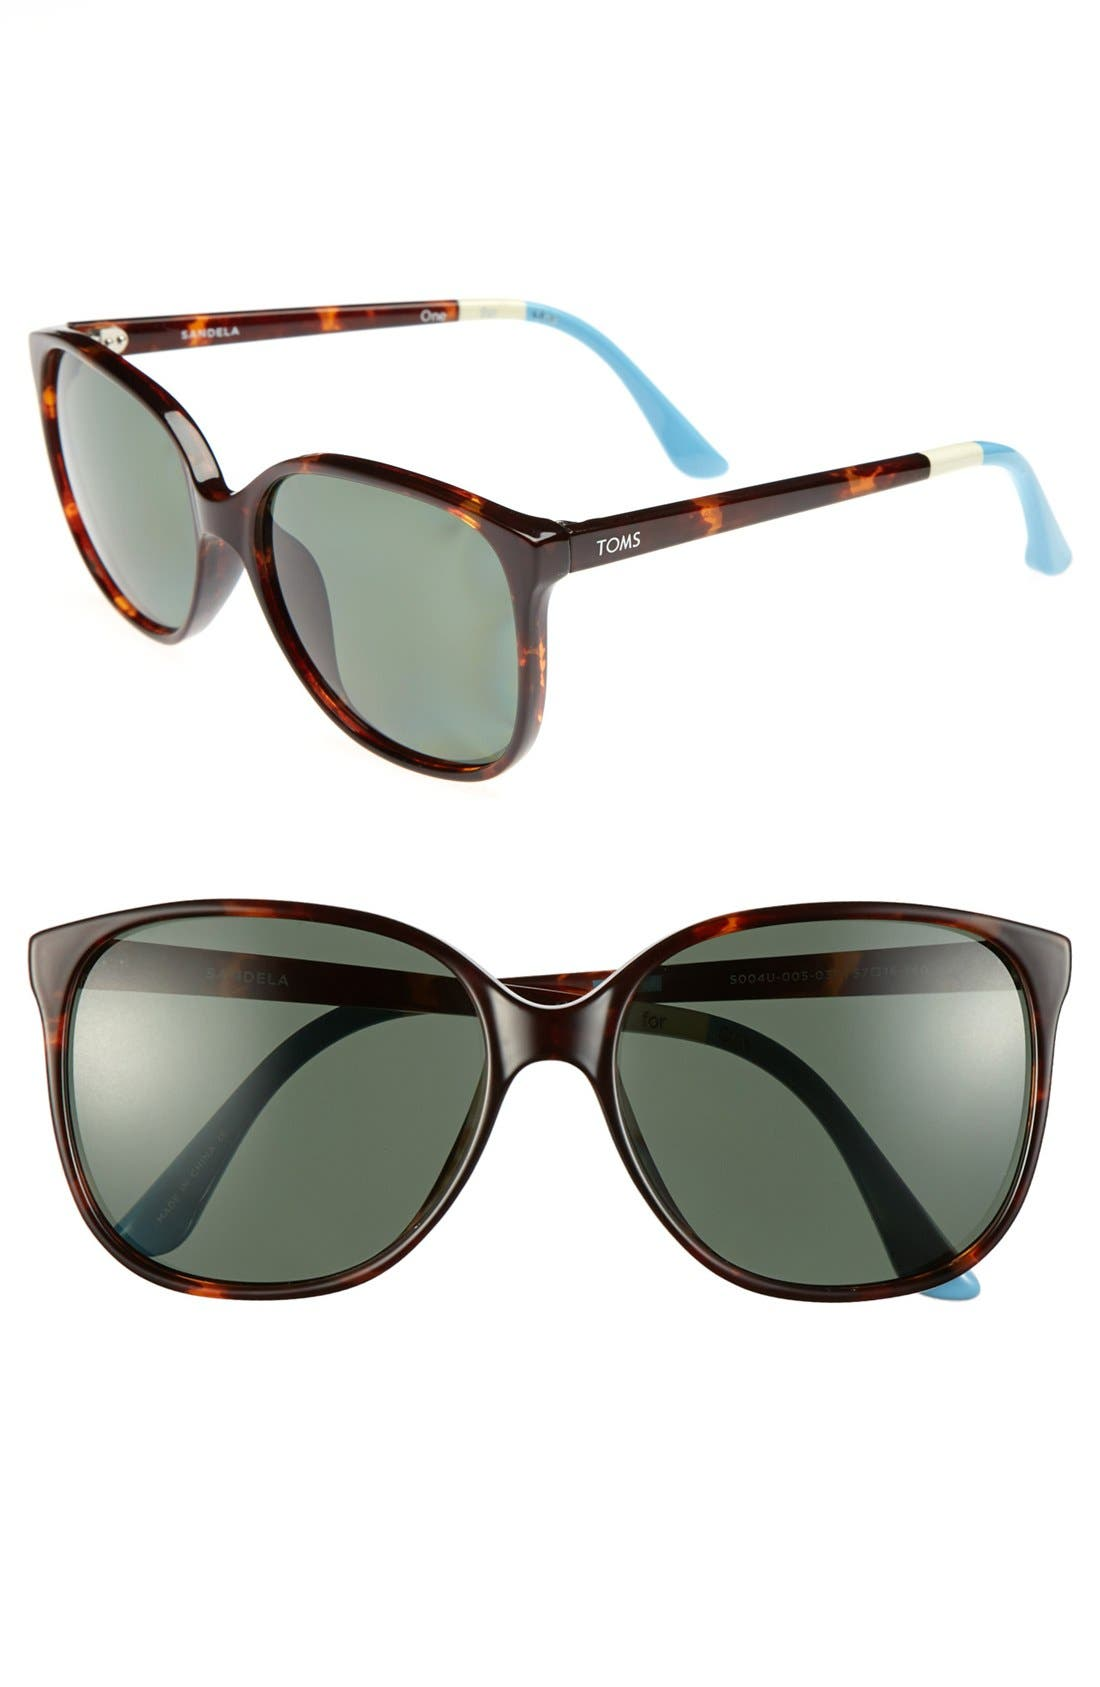 Main Image - TOMS 'Sandela' 57mm Polarized Sunglasses